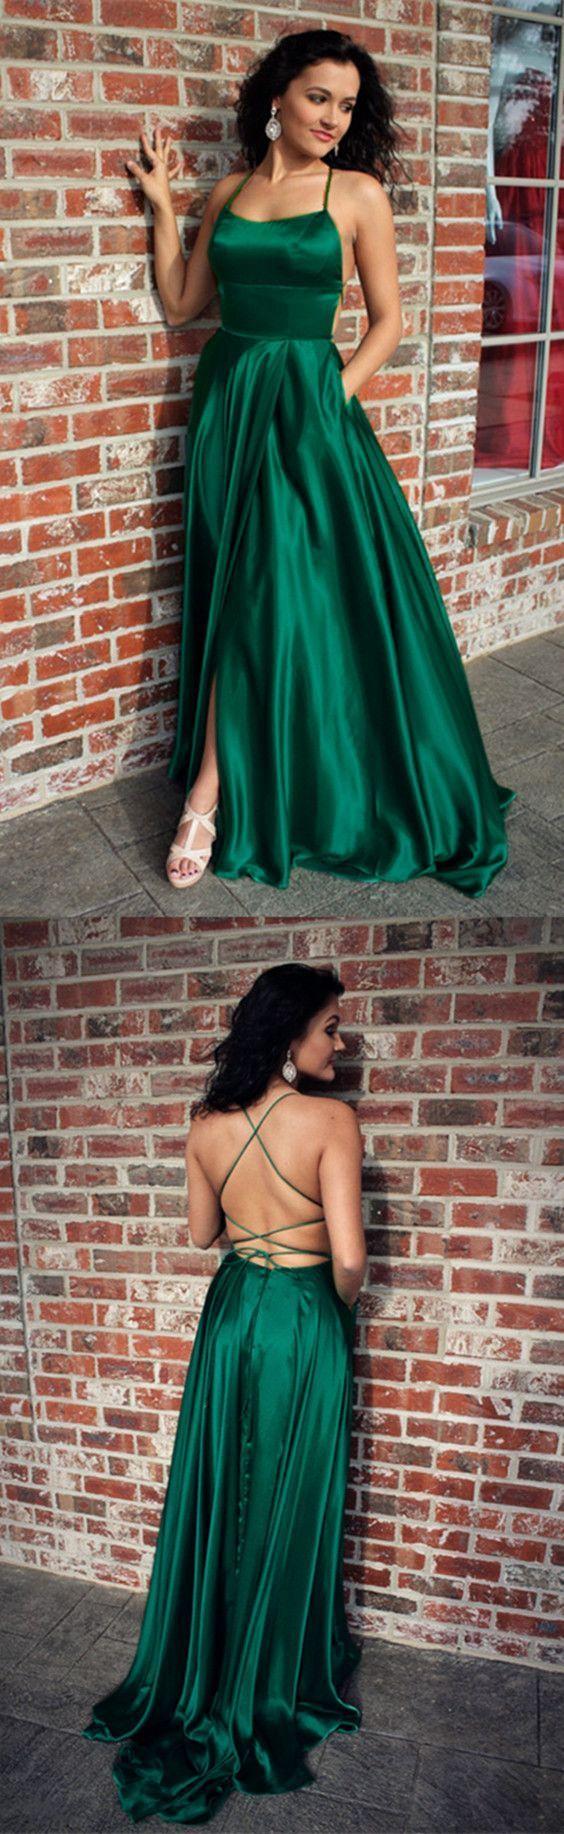 Dark Green Bridesmaid DressesLong Prom DressesEmerald Green Prom